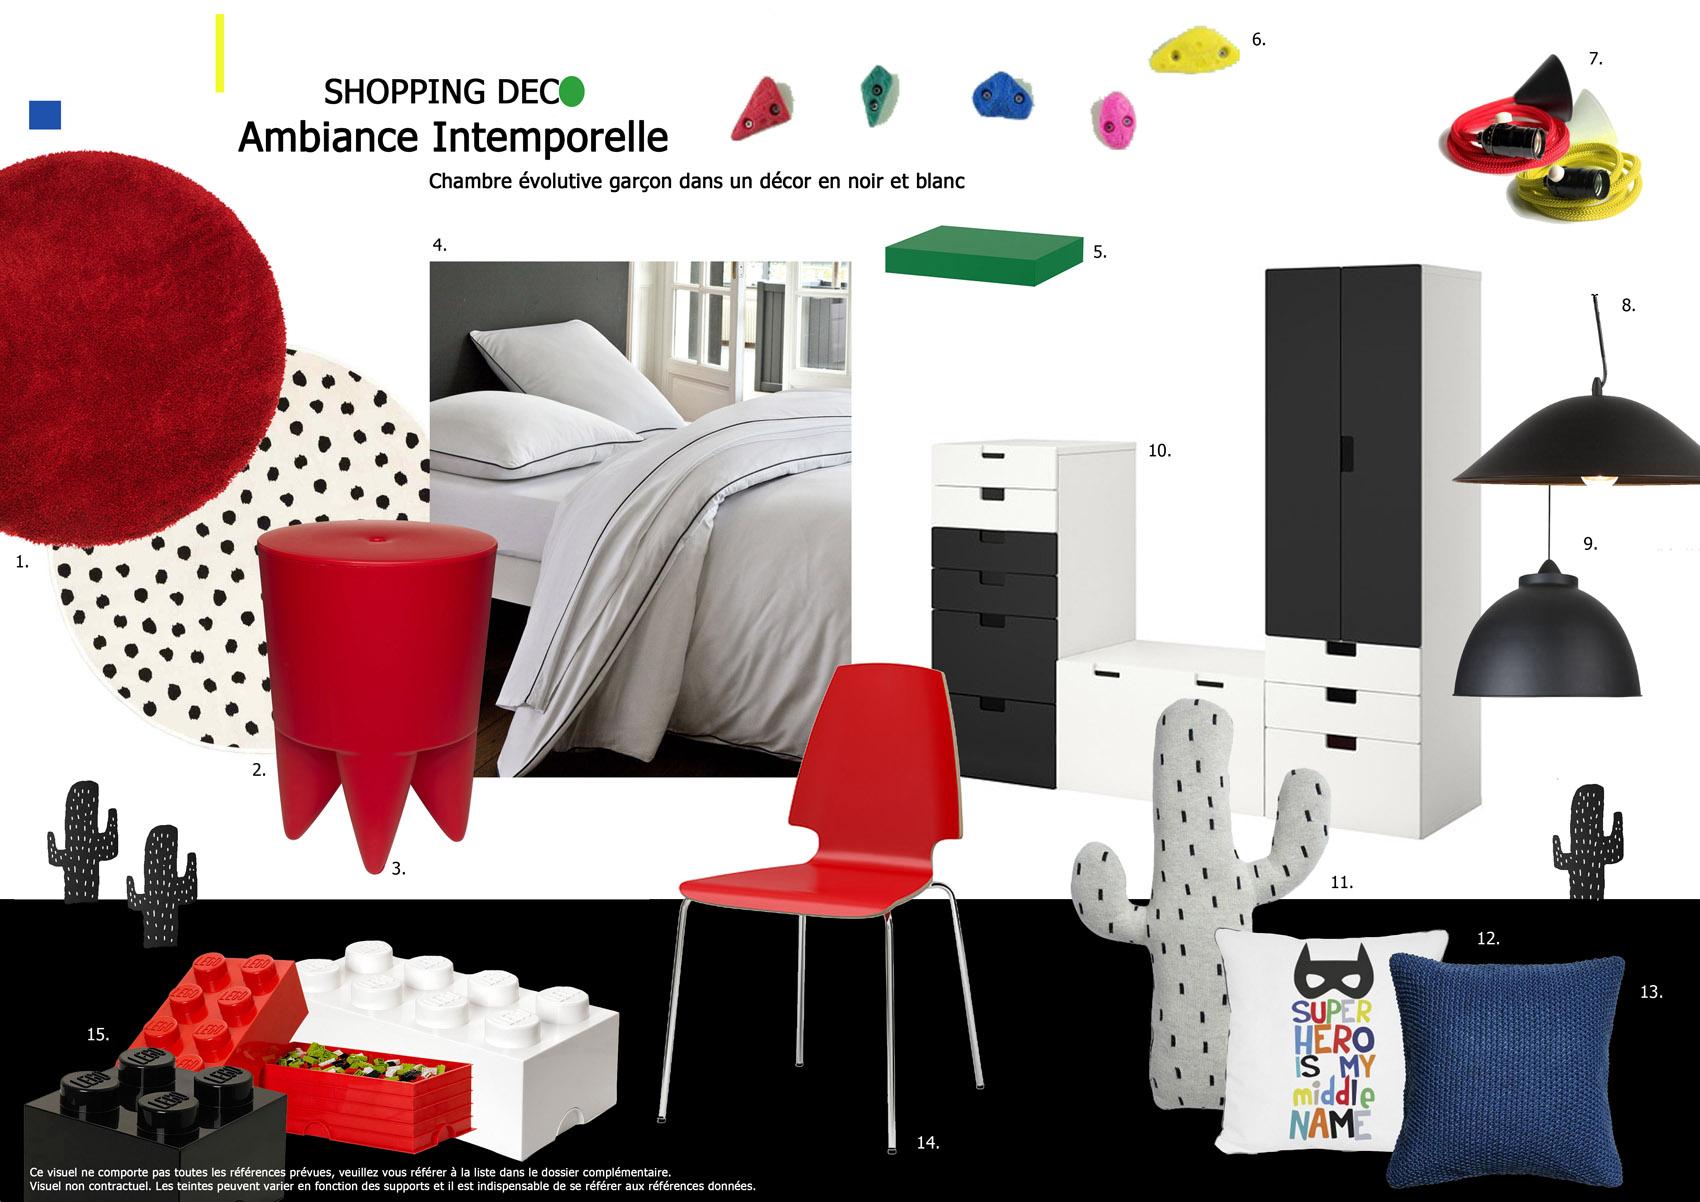 Chambre Garçon Évolutive | Anne-Solenn Cherat, Décoratrice UFDI | 56